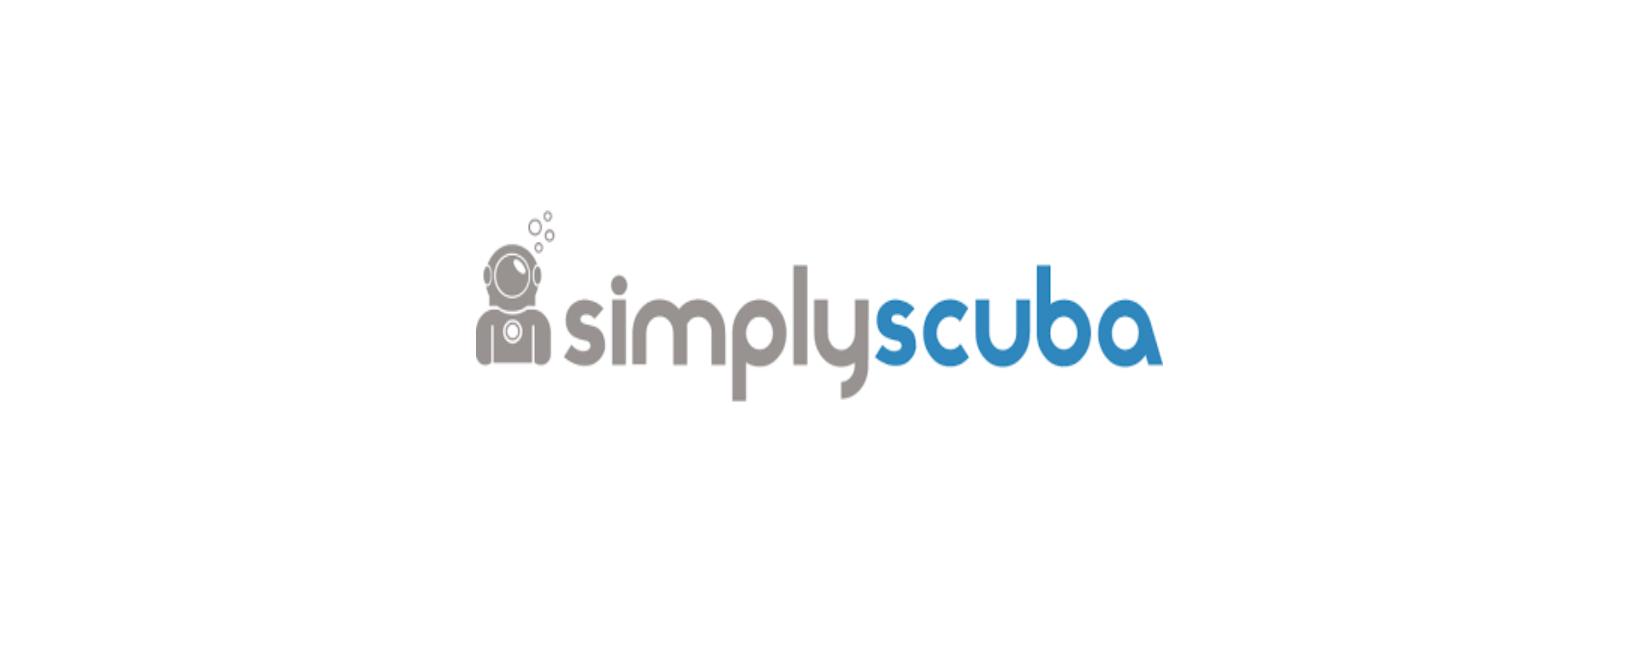 Simply Scuba UK Discount Code 2021